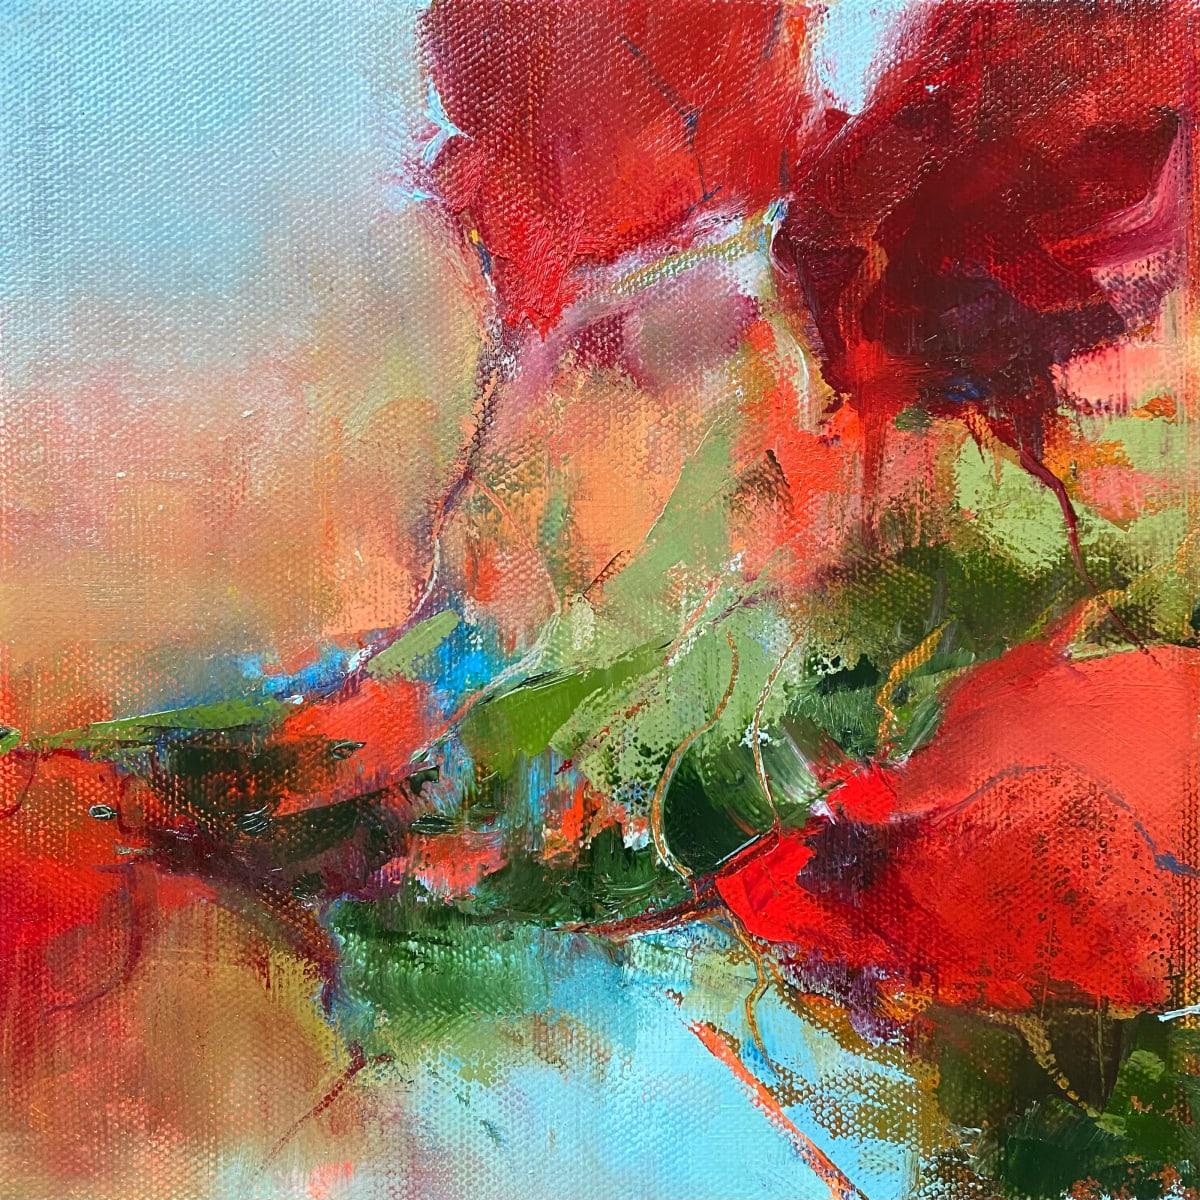 Golden Dance by Judy McSween